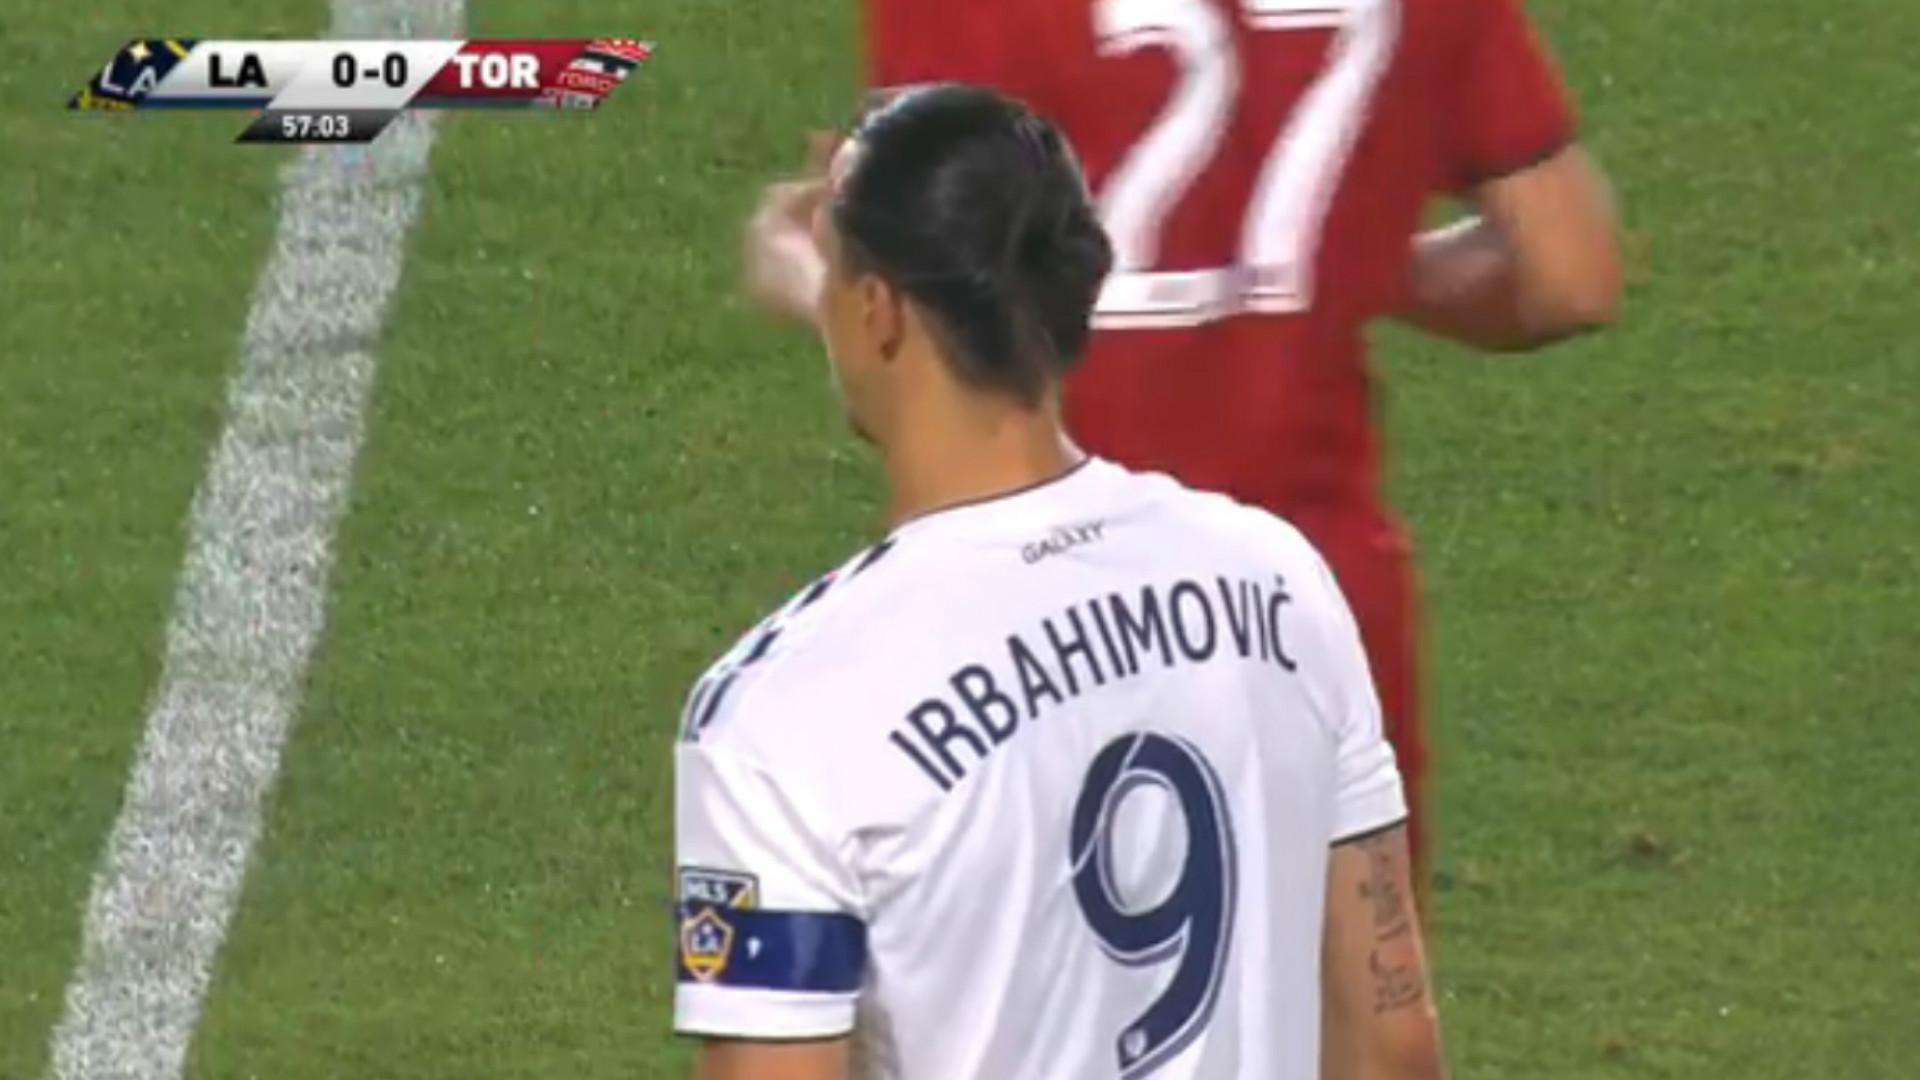 newest collection 09415 dc2d6 MSL news: La Galaxy match-winner Zlatan Ibrahimovic reacts ...